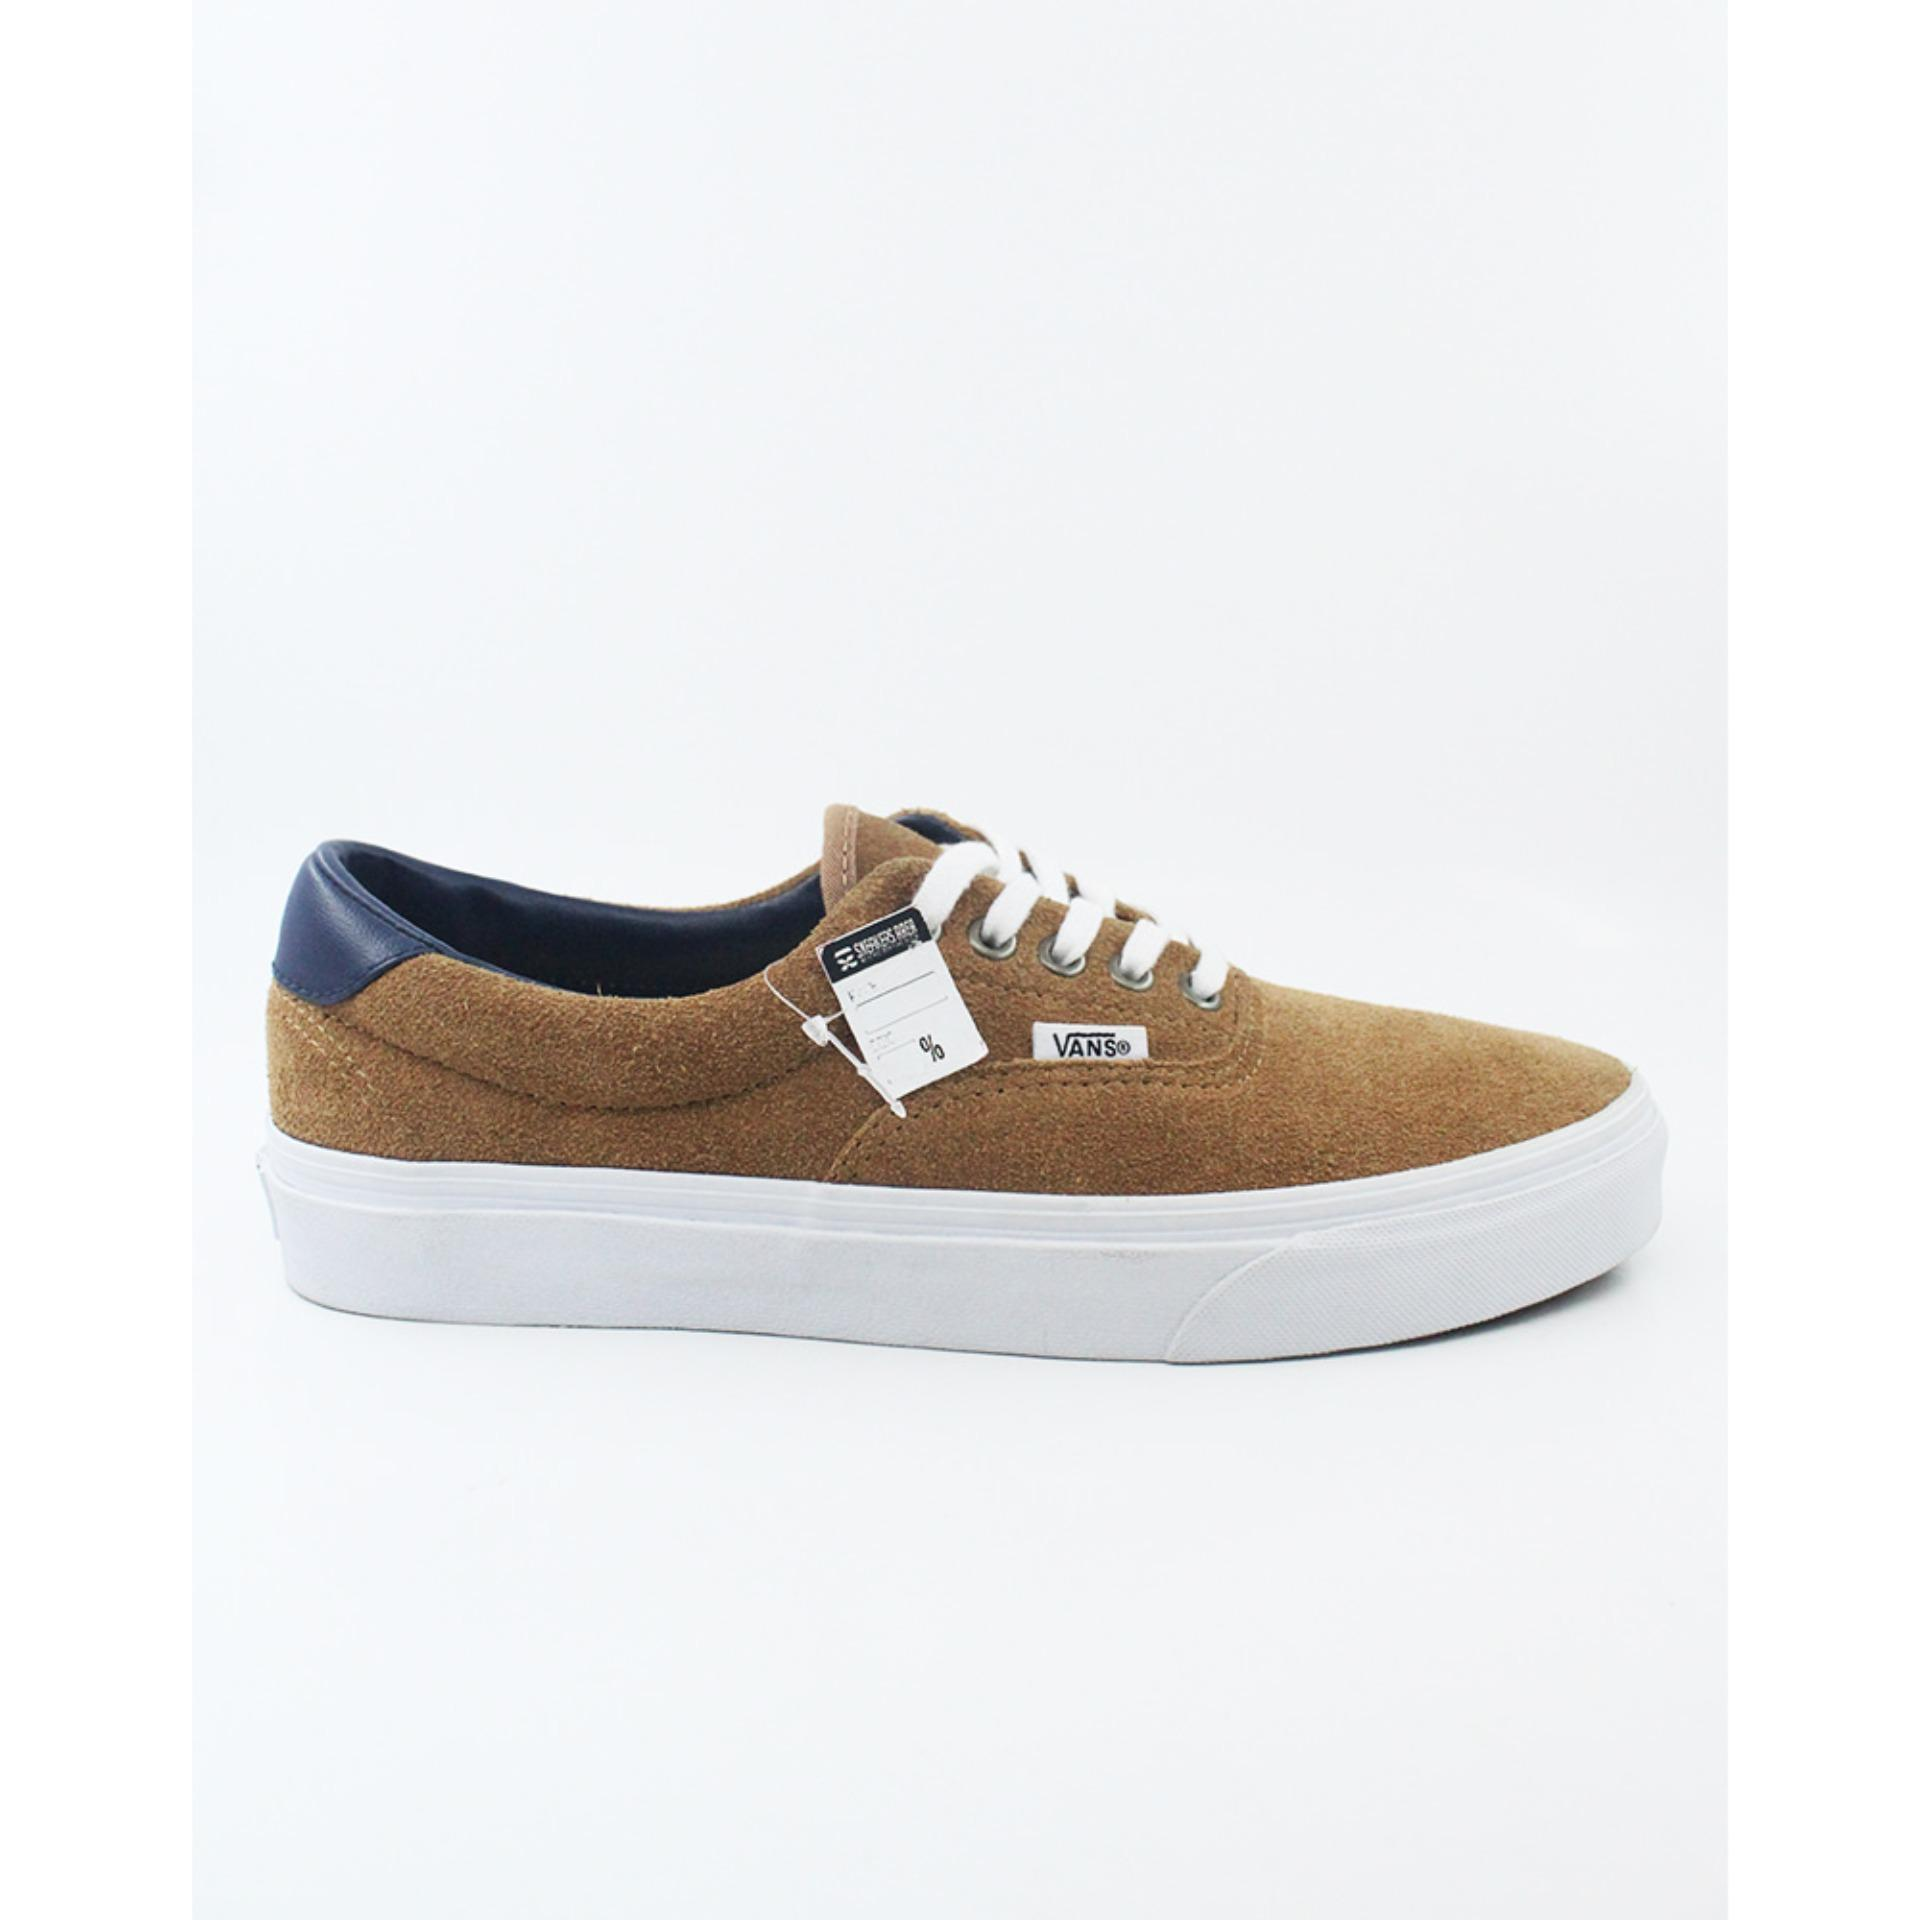 Vans Era 59 Suede Leather Sepatu Sneakers Pria